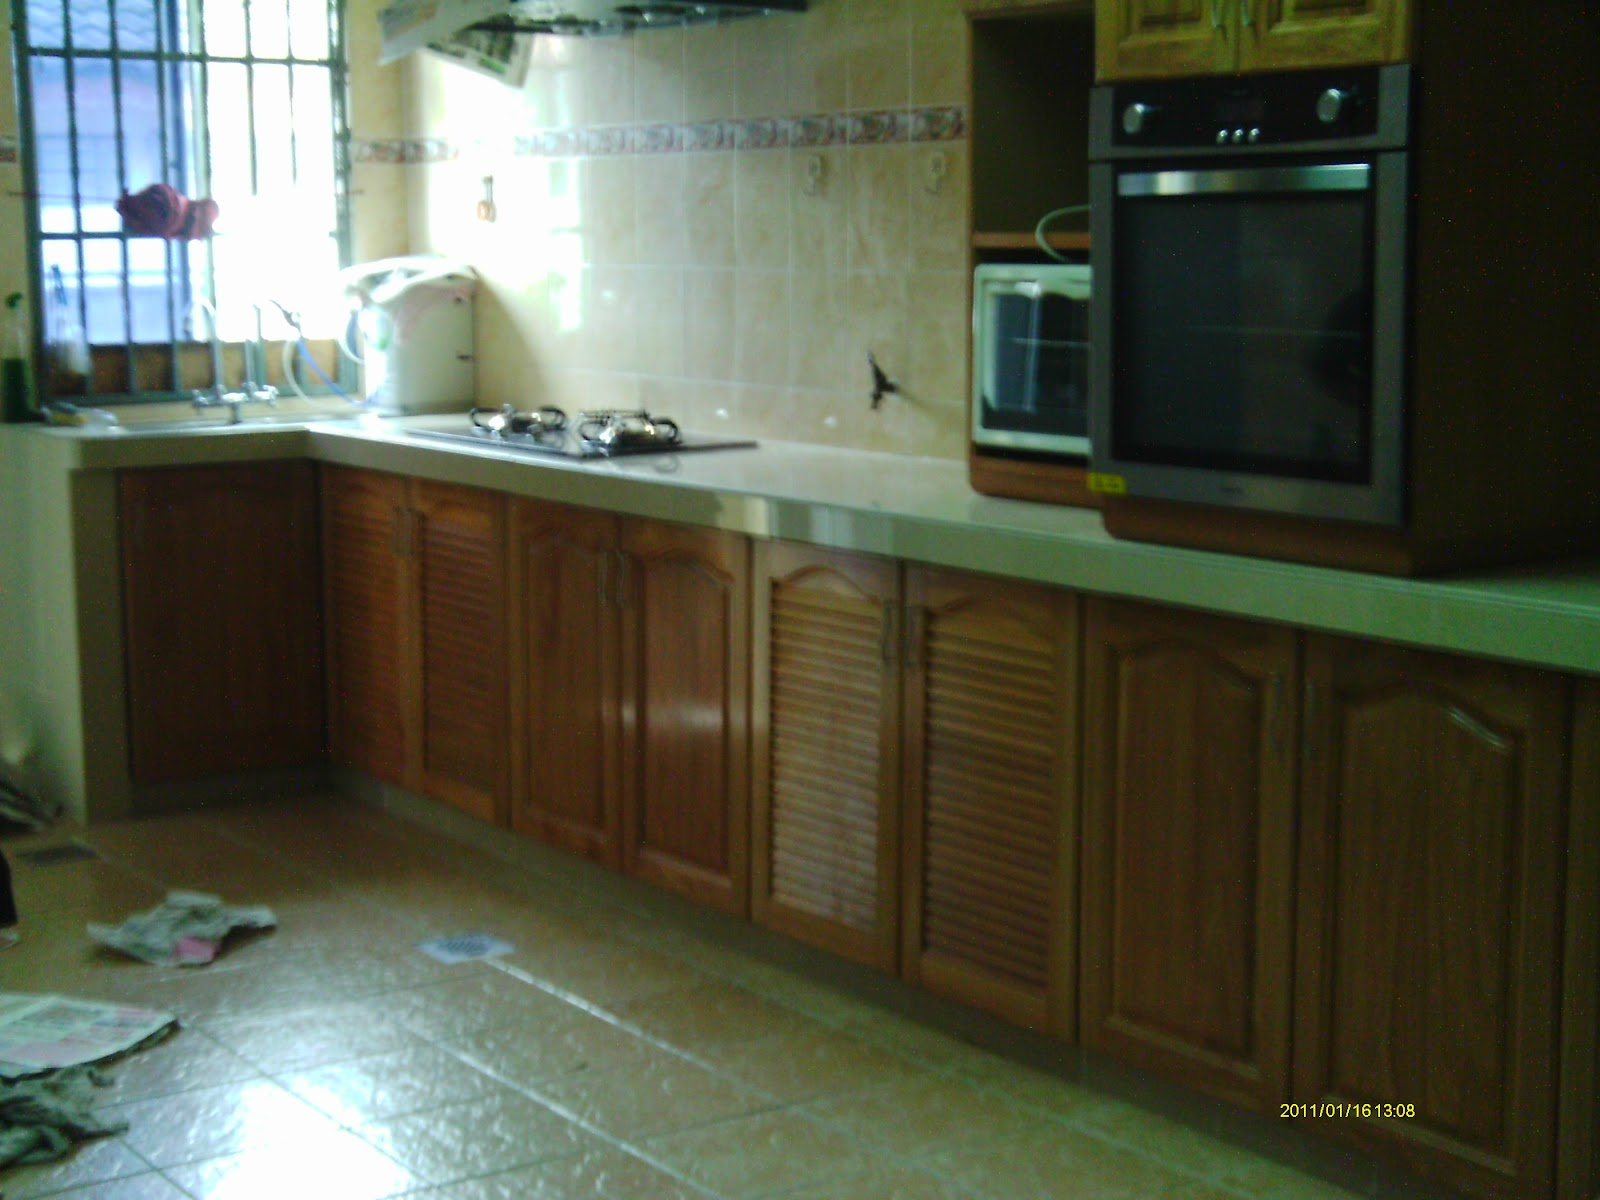 Pakar ubahsuai rumah gambar gambar kitchen kabinet 2012 for Kitchen kabinet